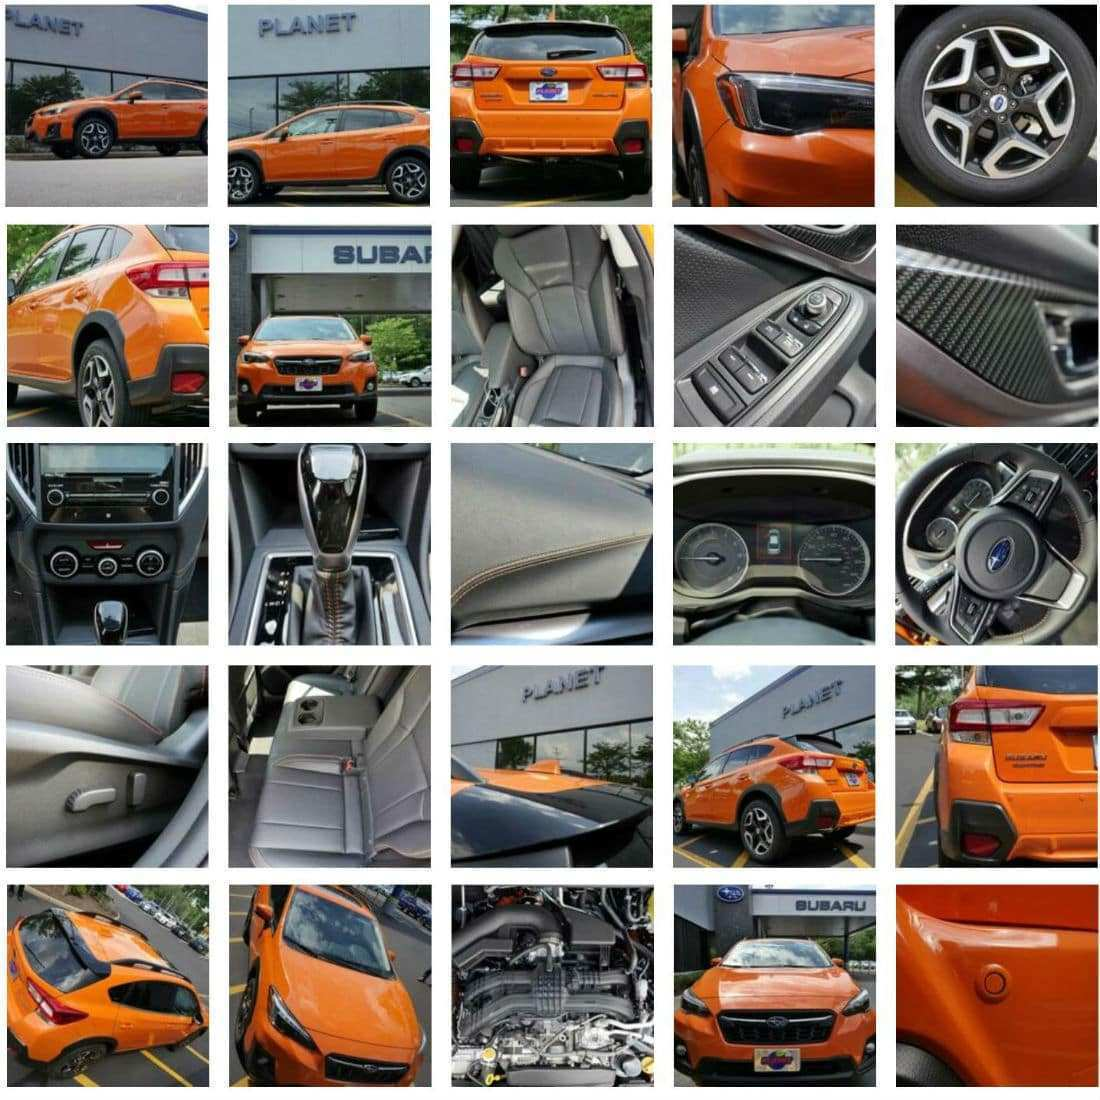 66 Gallery of New 2019 Subaru Crosstrek Khaki New Concept Configurations by New 2019 Subaru Crosstrek Khaki New Concept